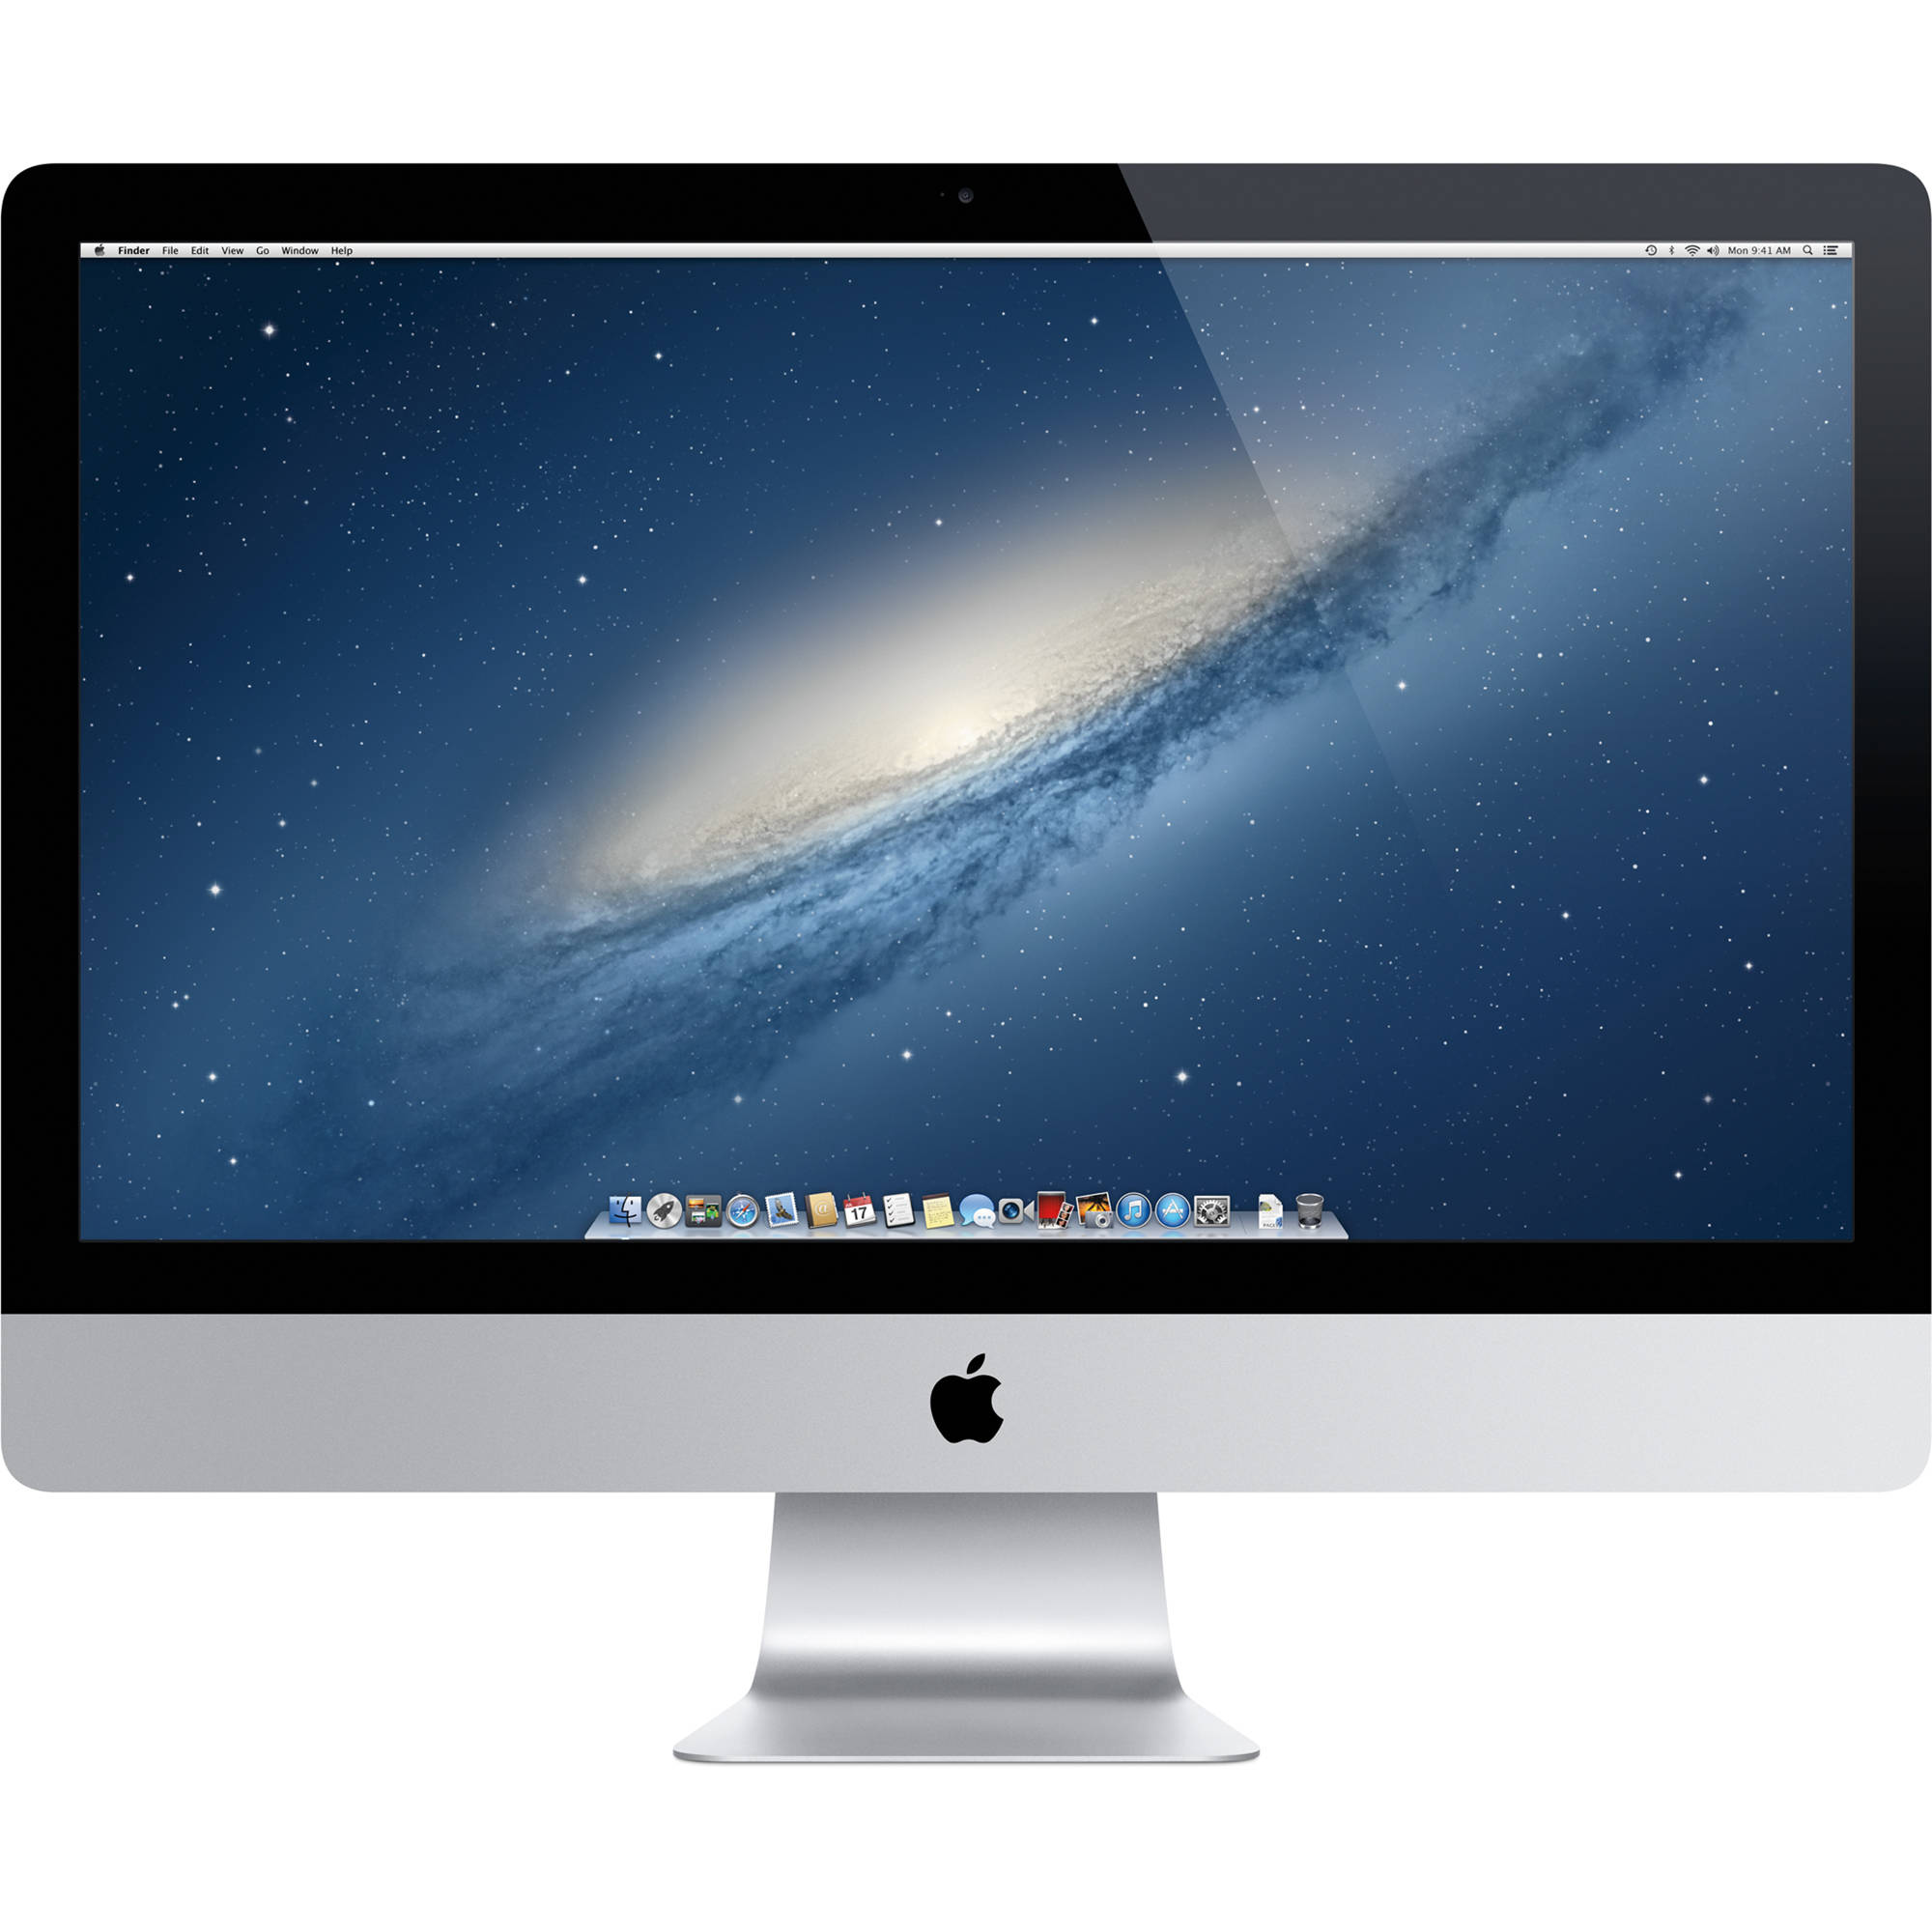 Apple 27 Quot Imac Desktop Computer Late 2012 Z0ms Md09610